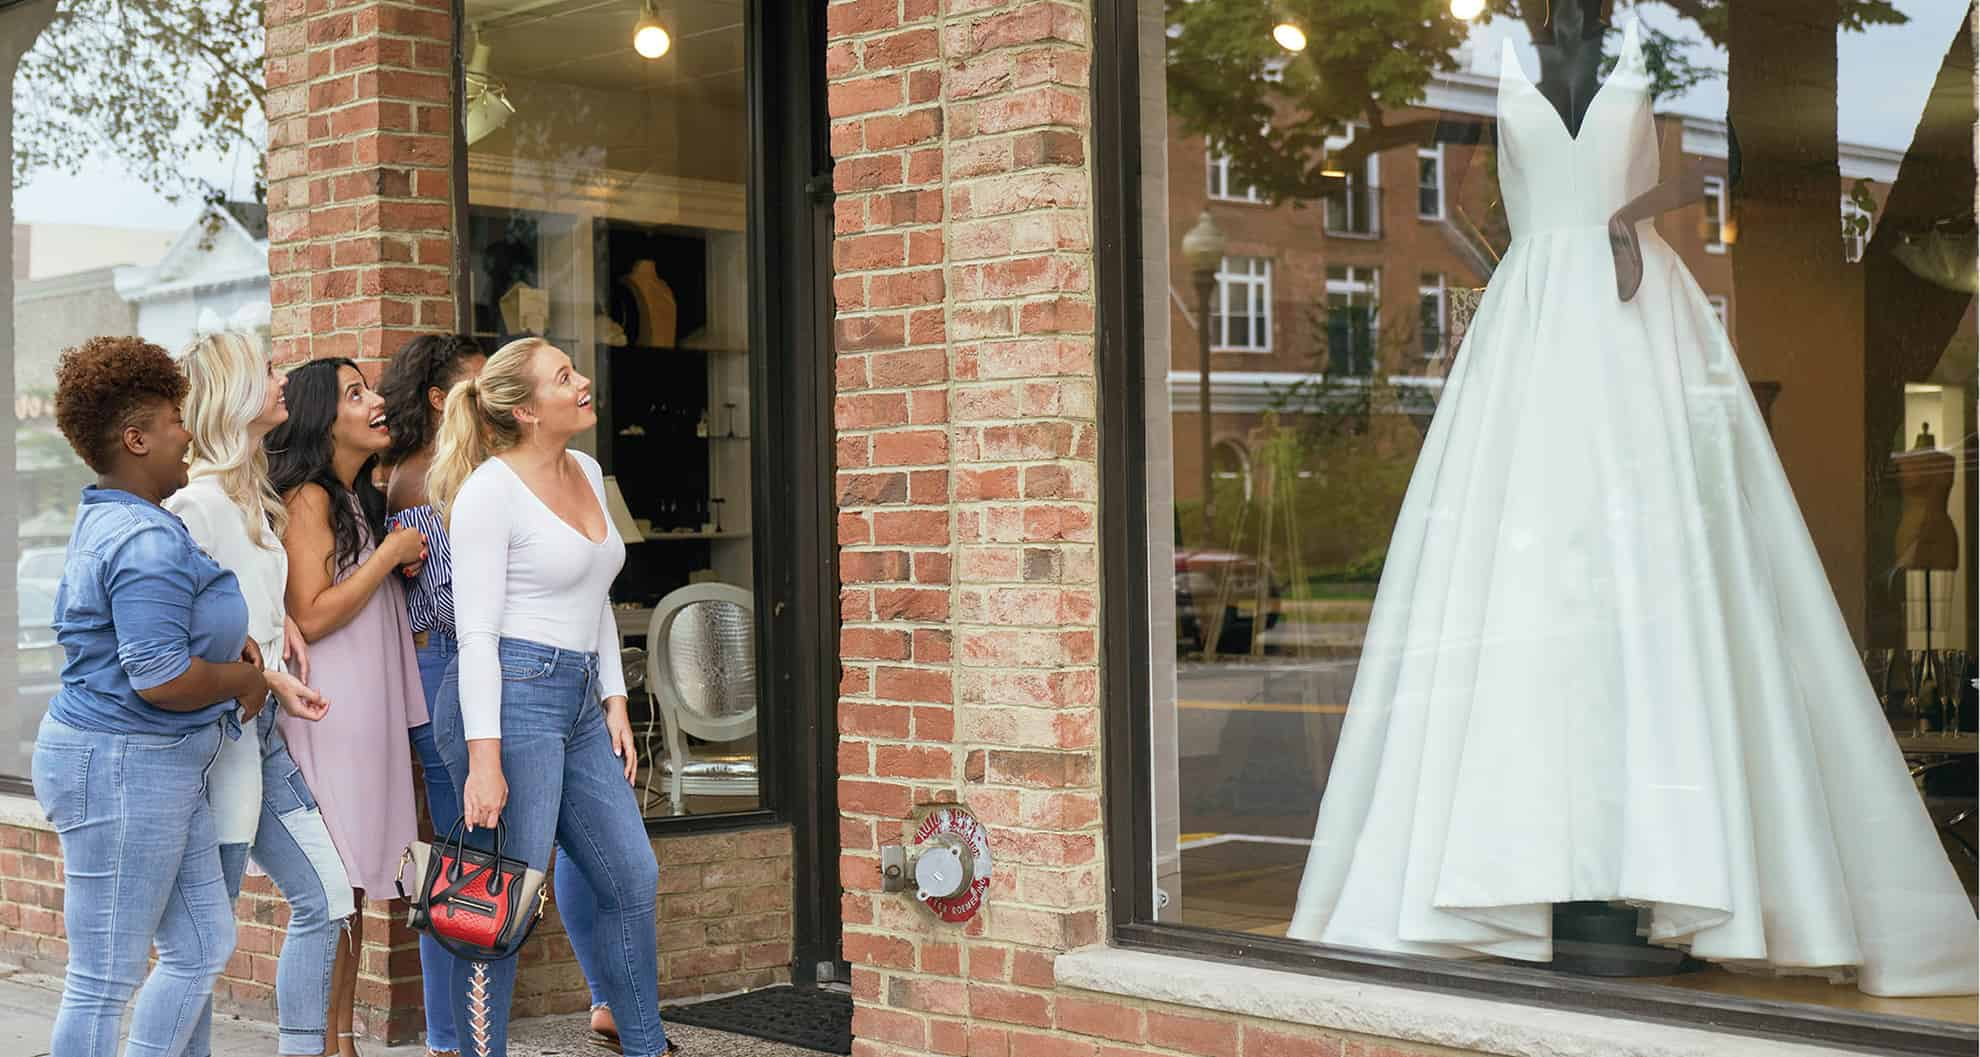 Wedding dress hunt